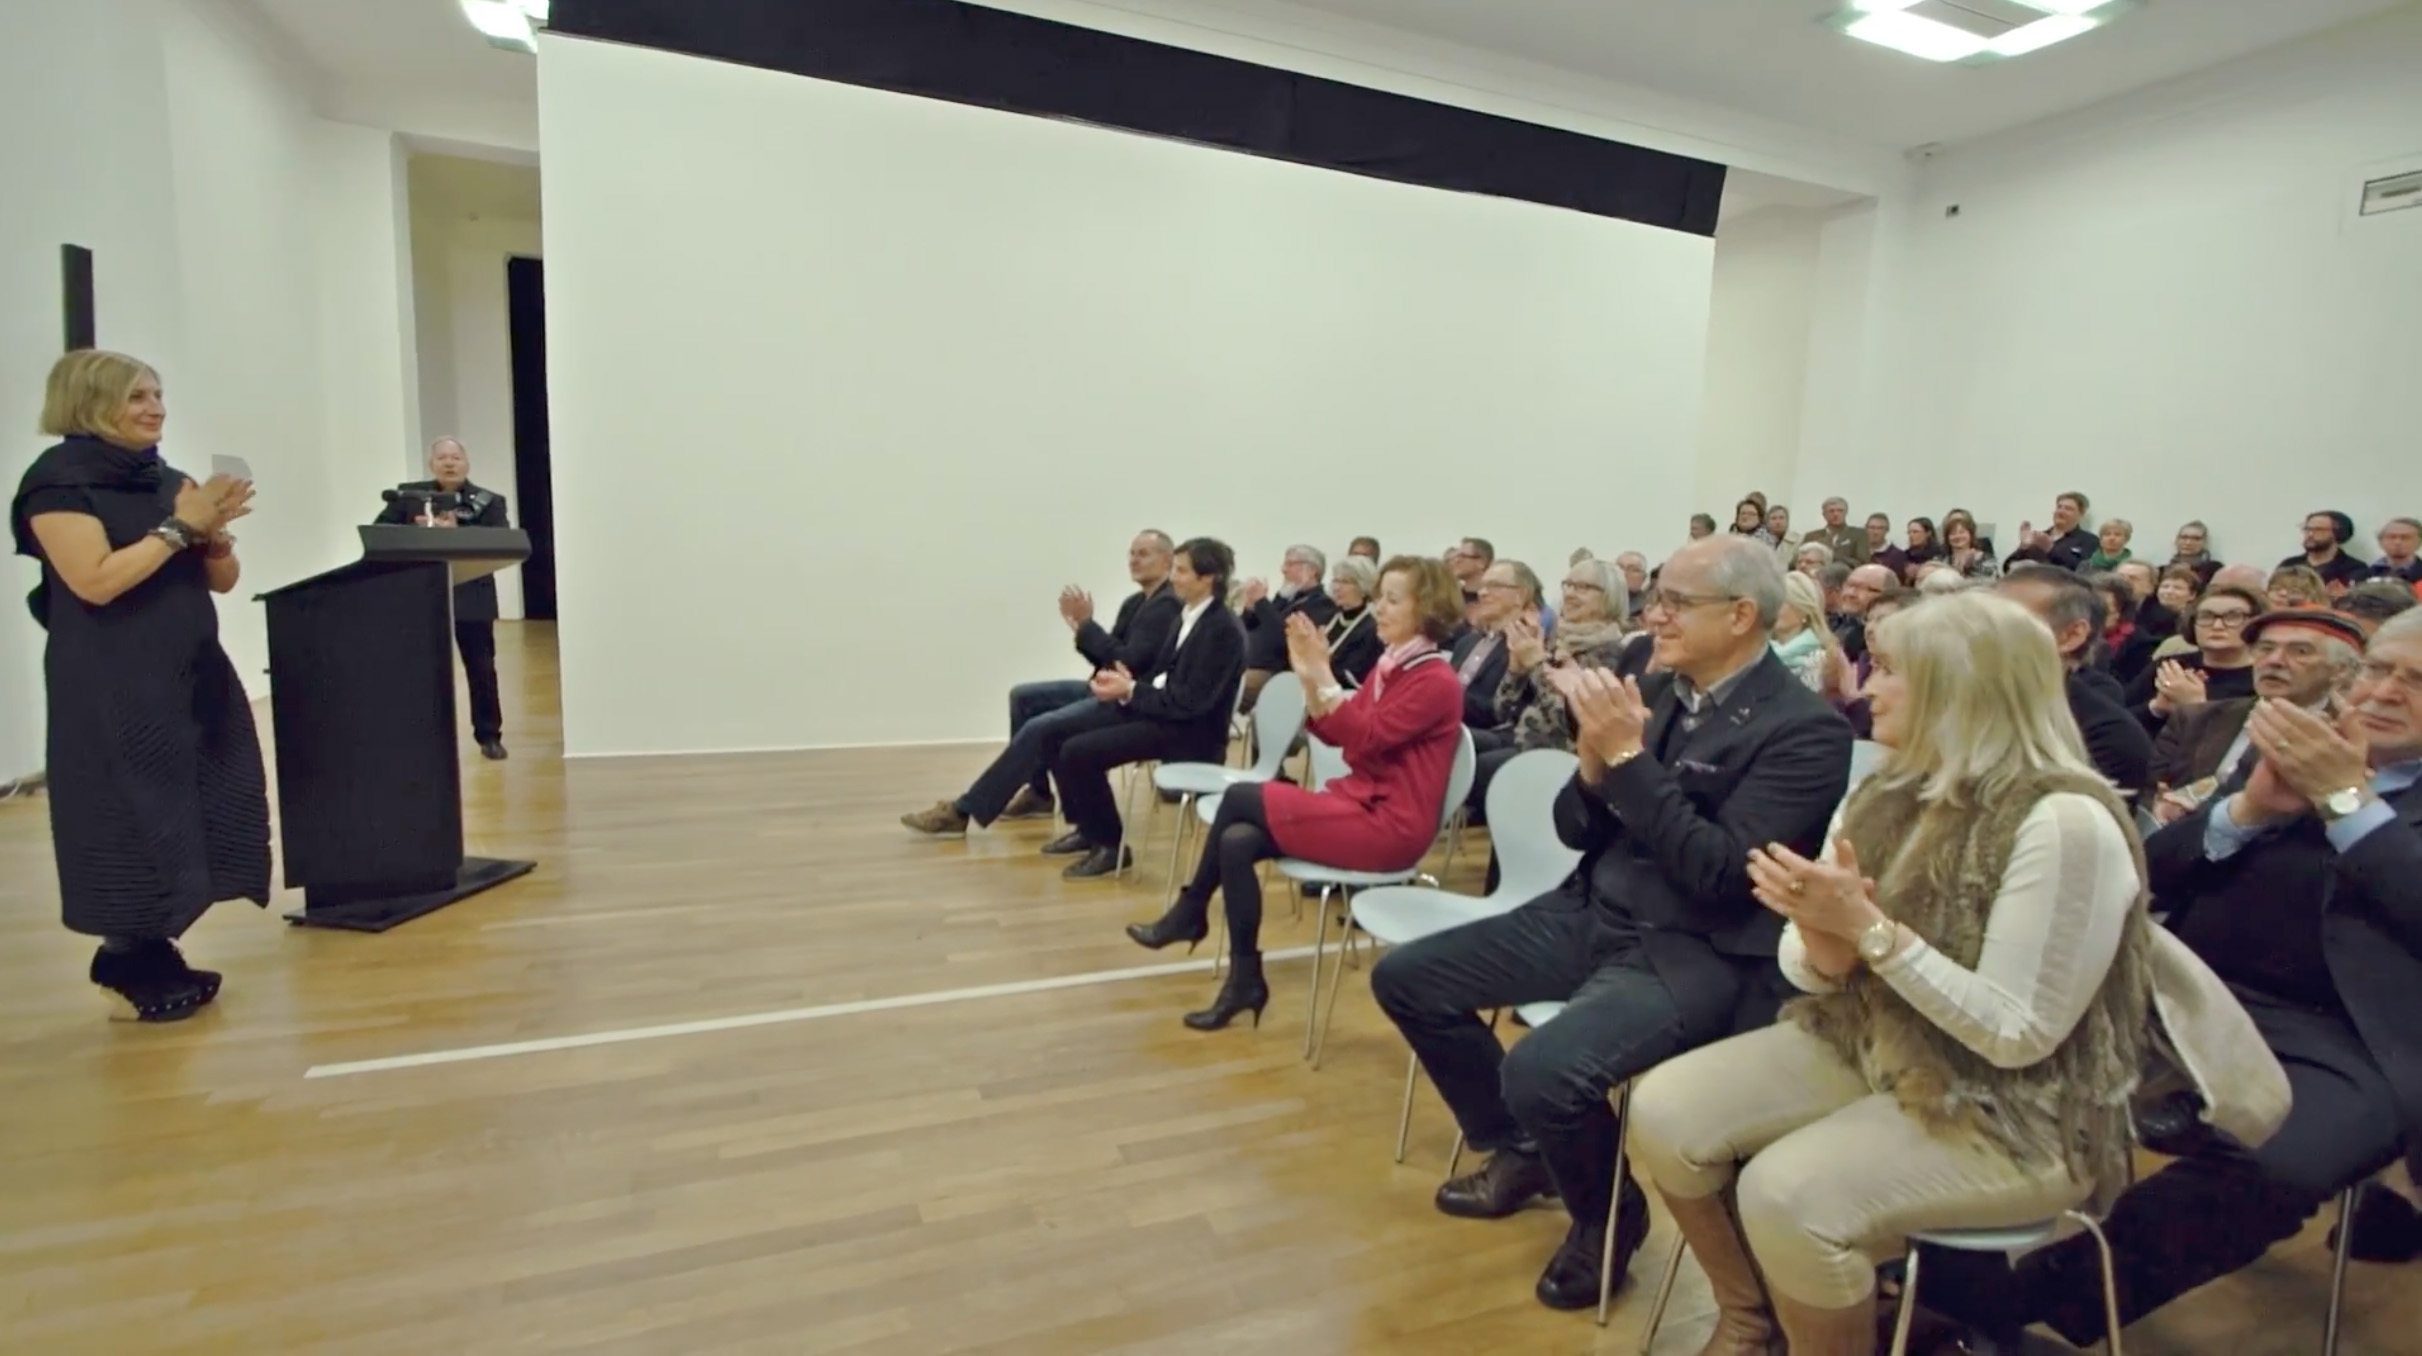 grimanesa Amoros ludwig museum Koblenz lecture